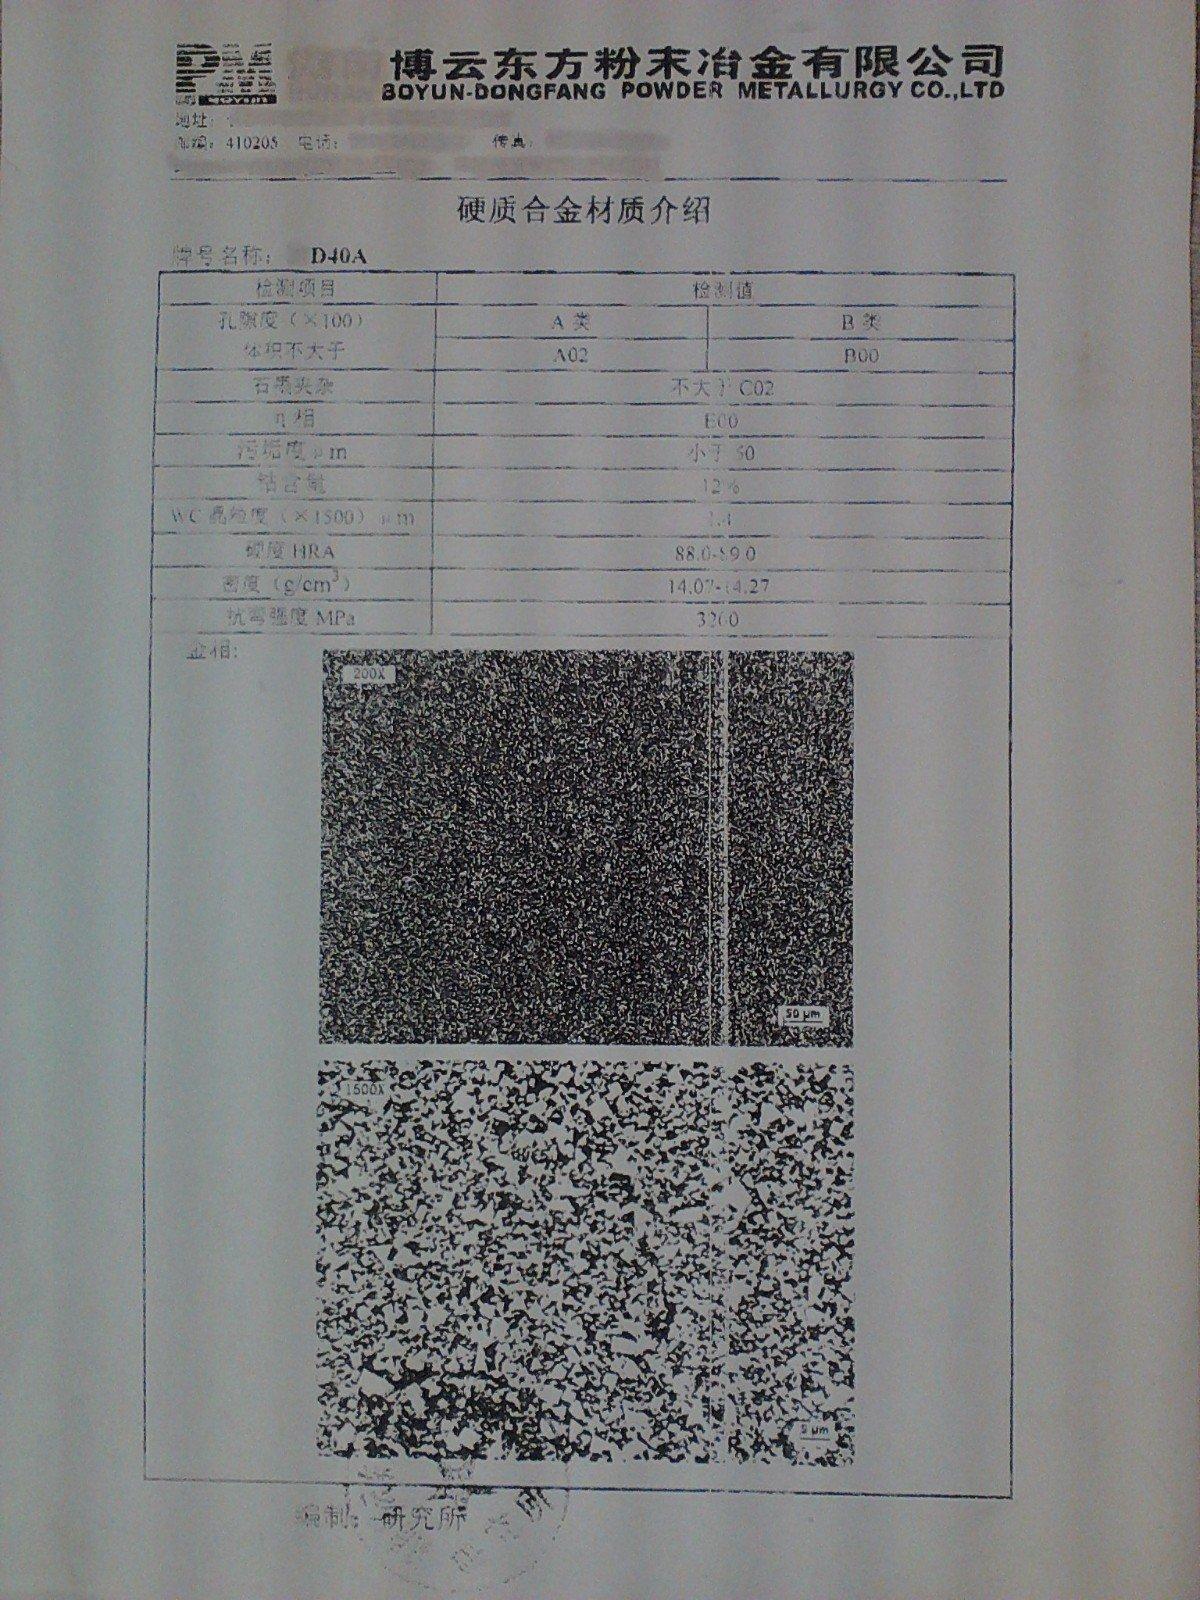 HG Precision Mold Components